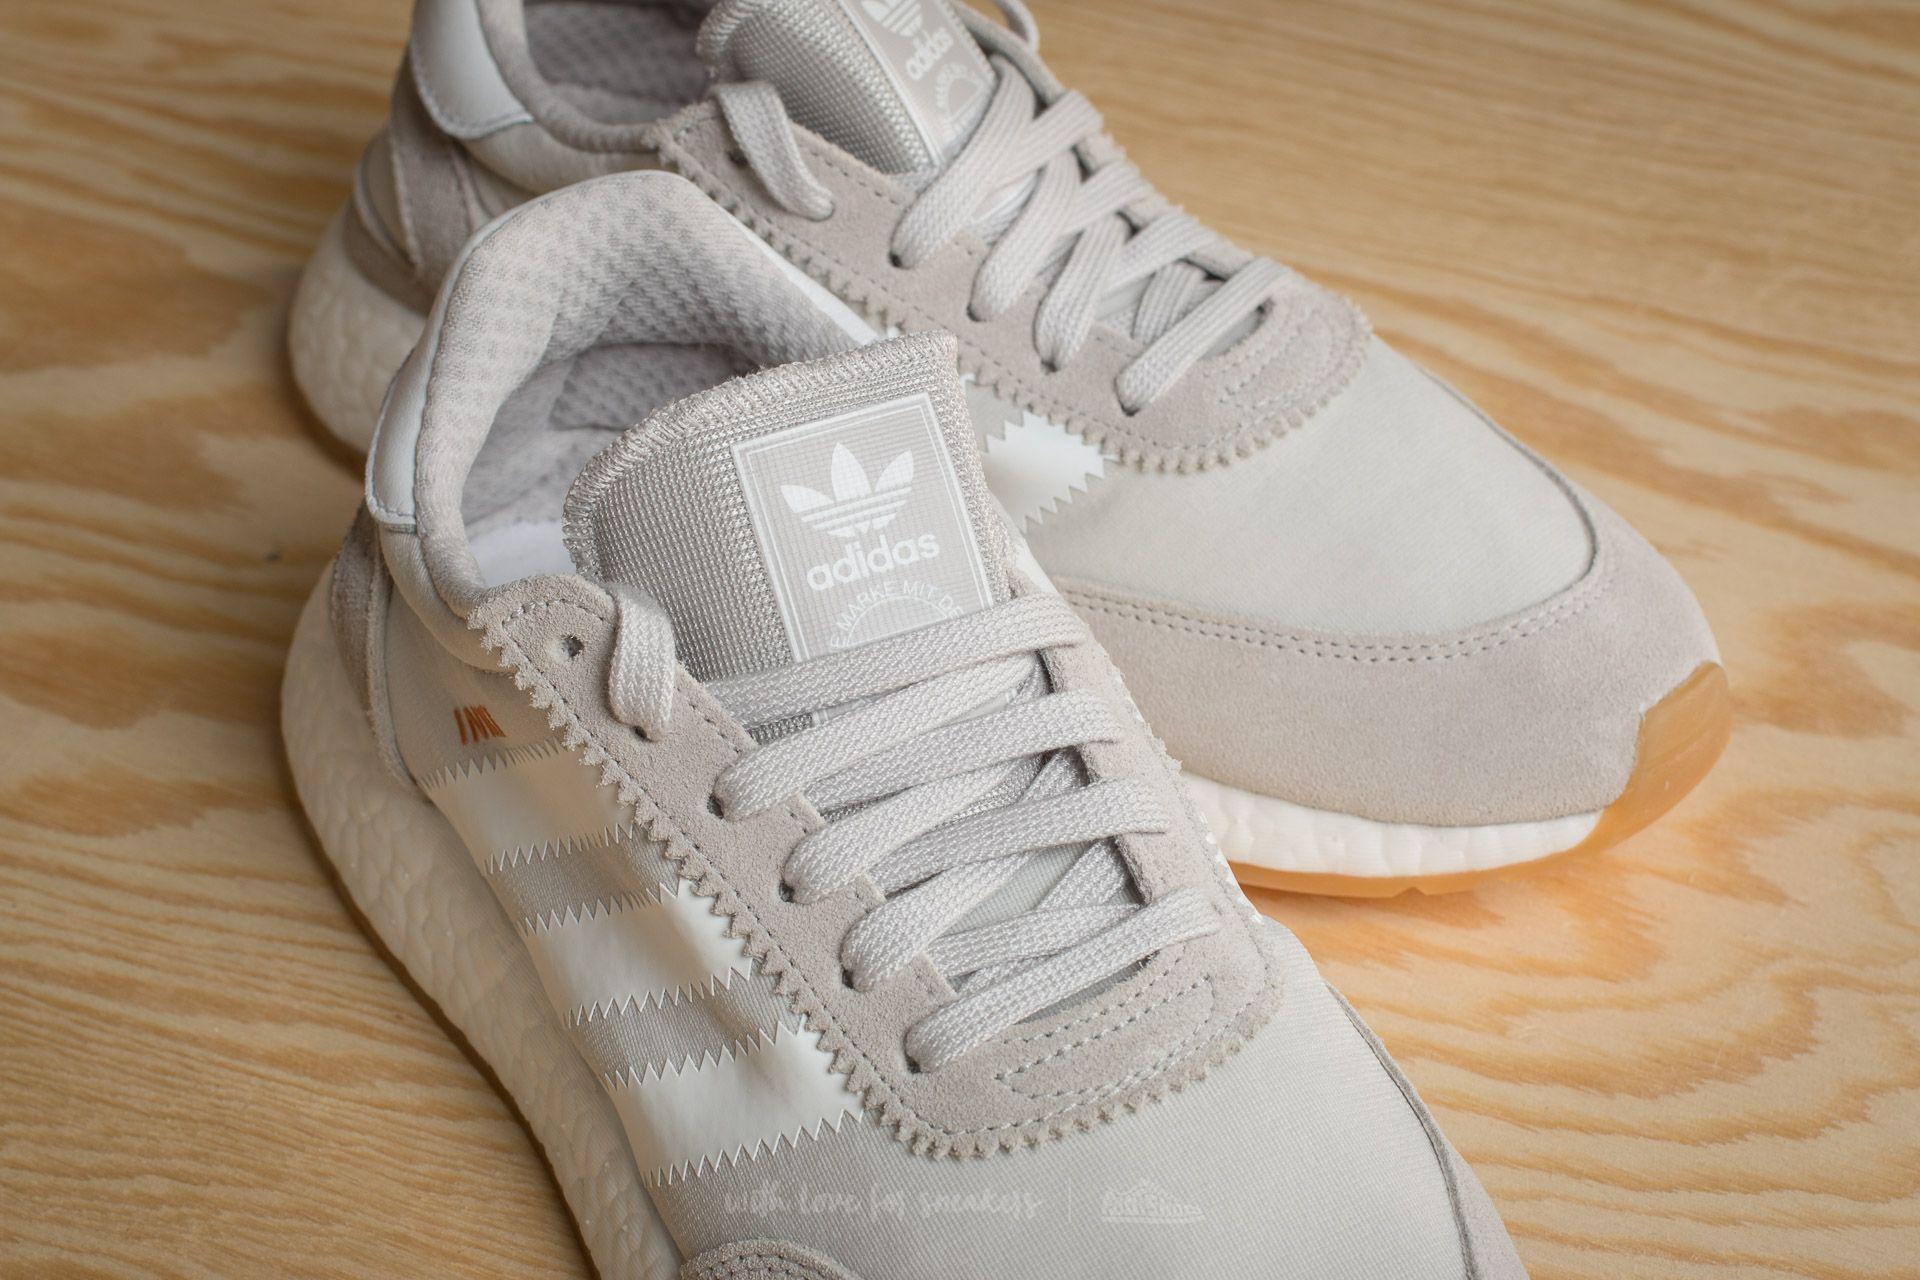 separation shoes cb3f9 b3478 Lyst - adidas Originals Adidas Iniki Runner W Running White Ftw ...